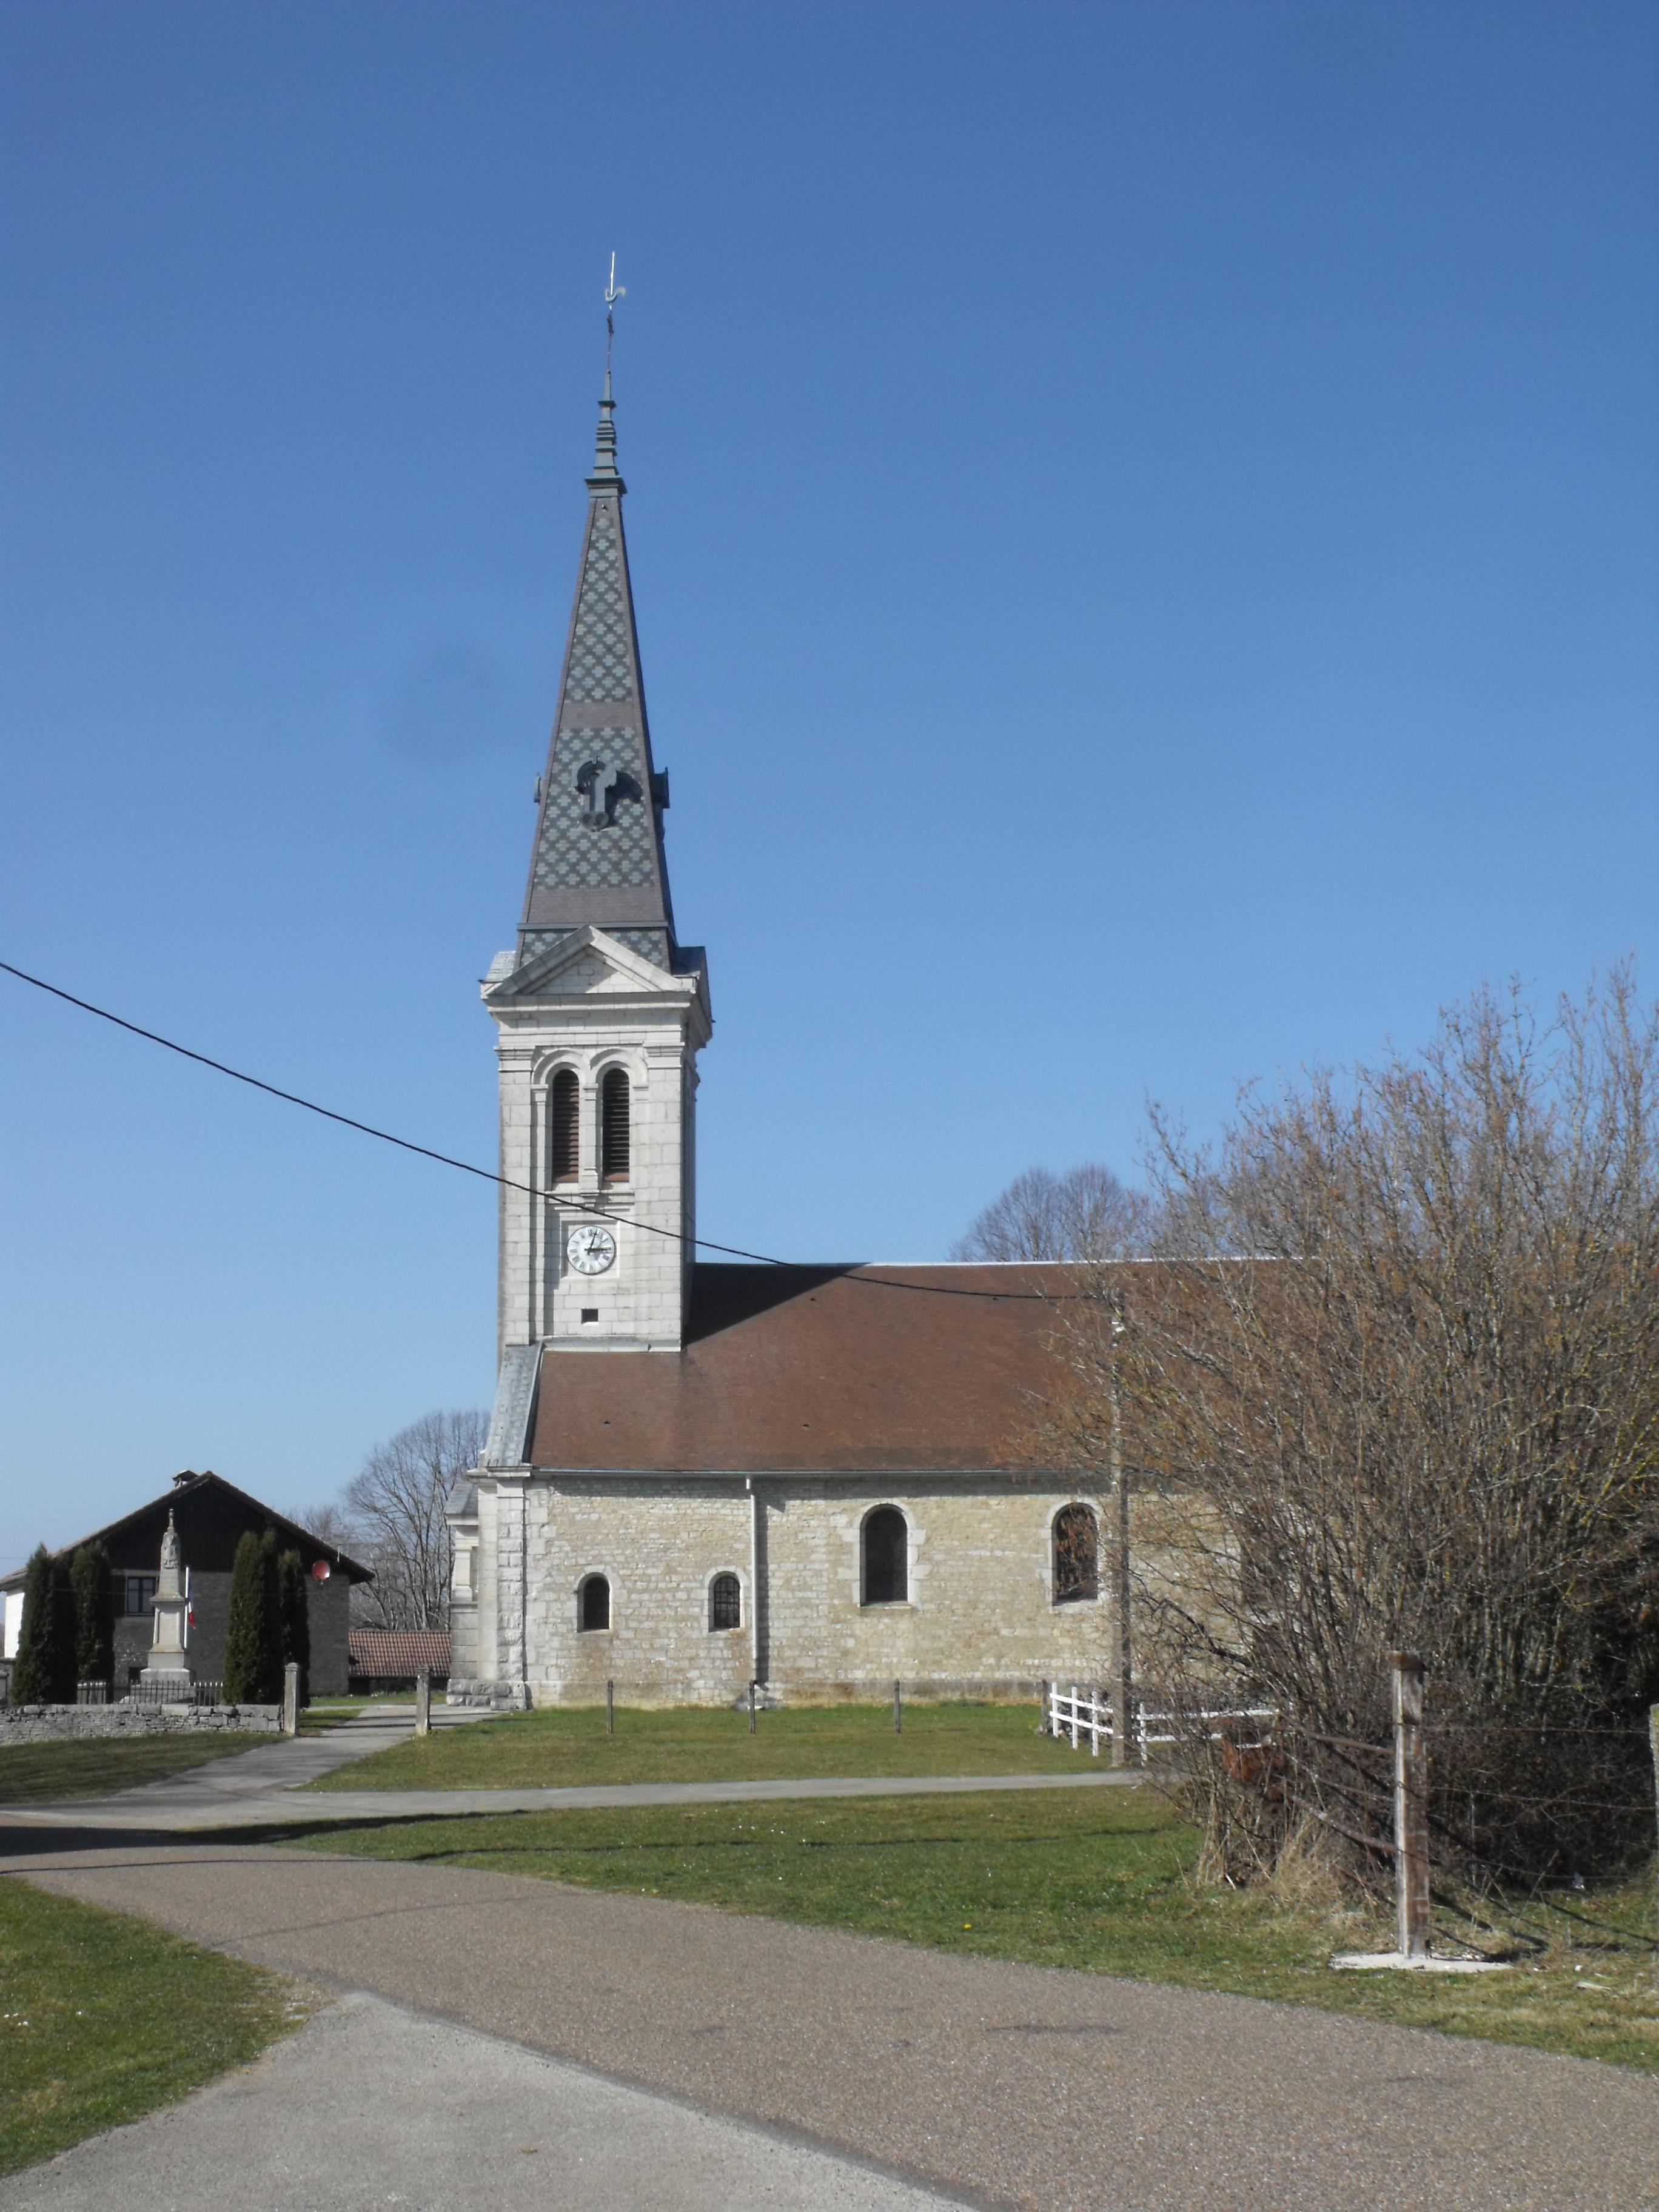 Villers-la-Combe